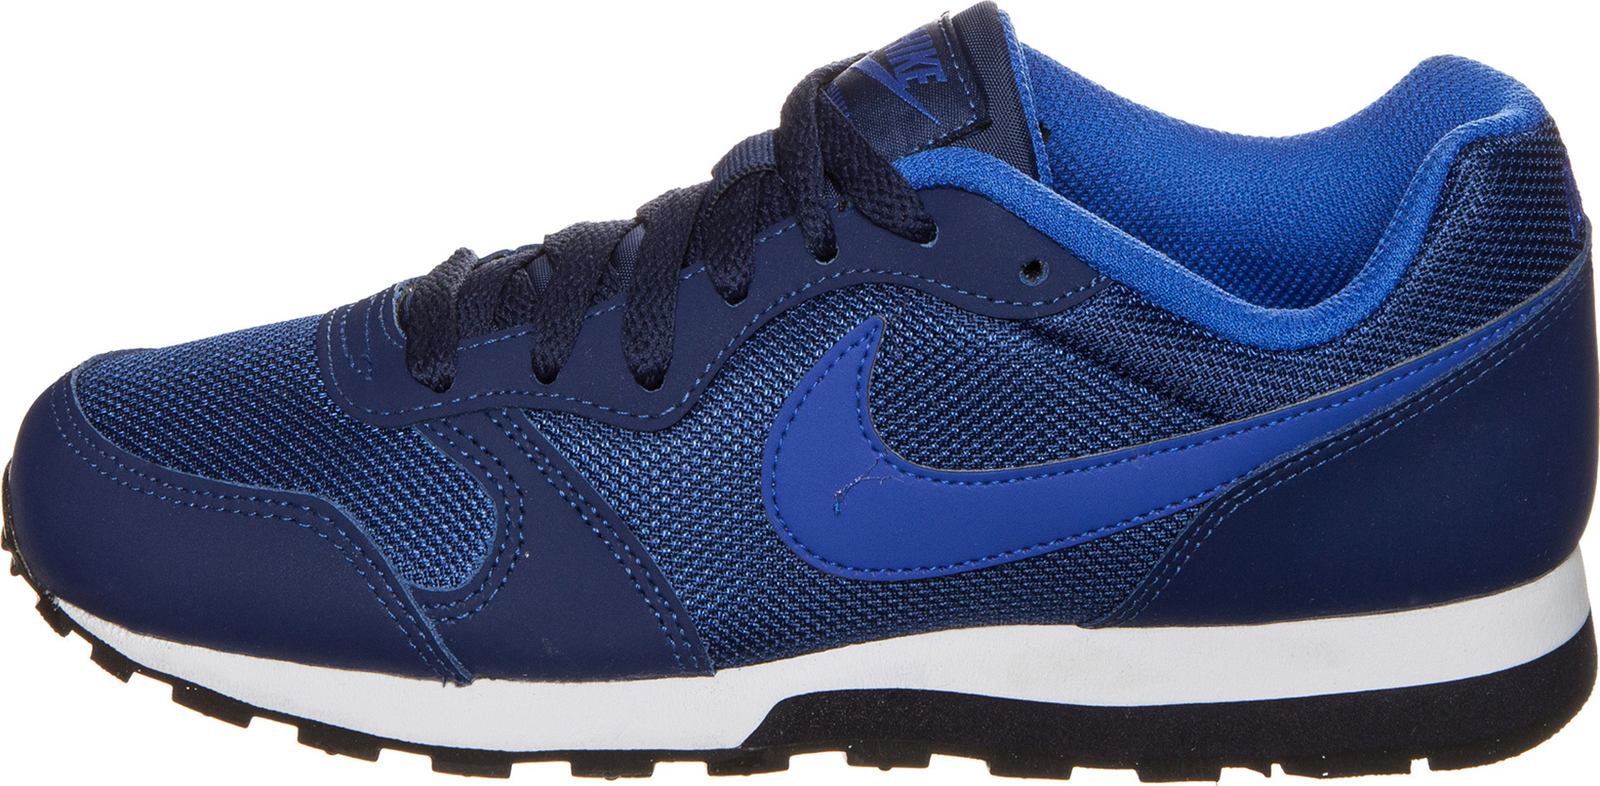 d0468a24c Nike Md Runner 2 GS 807316-405 - Skroutz.gr